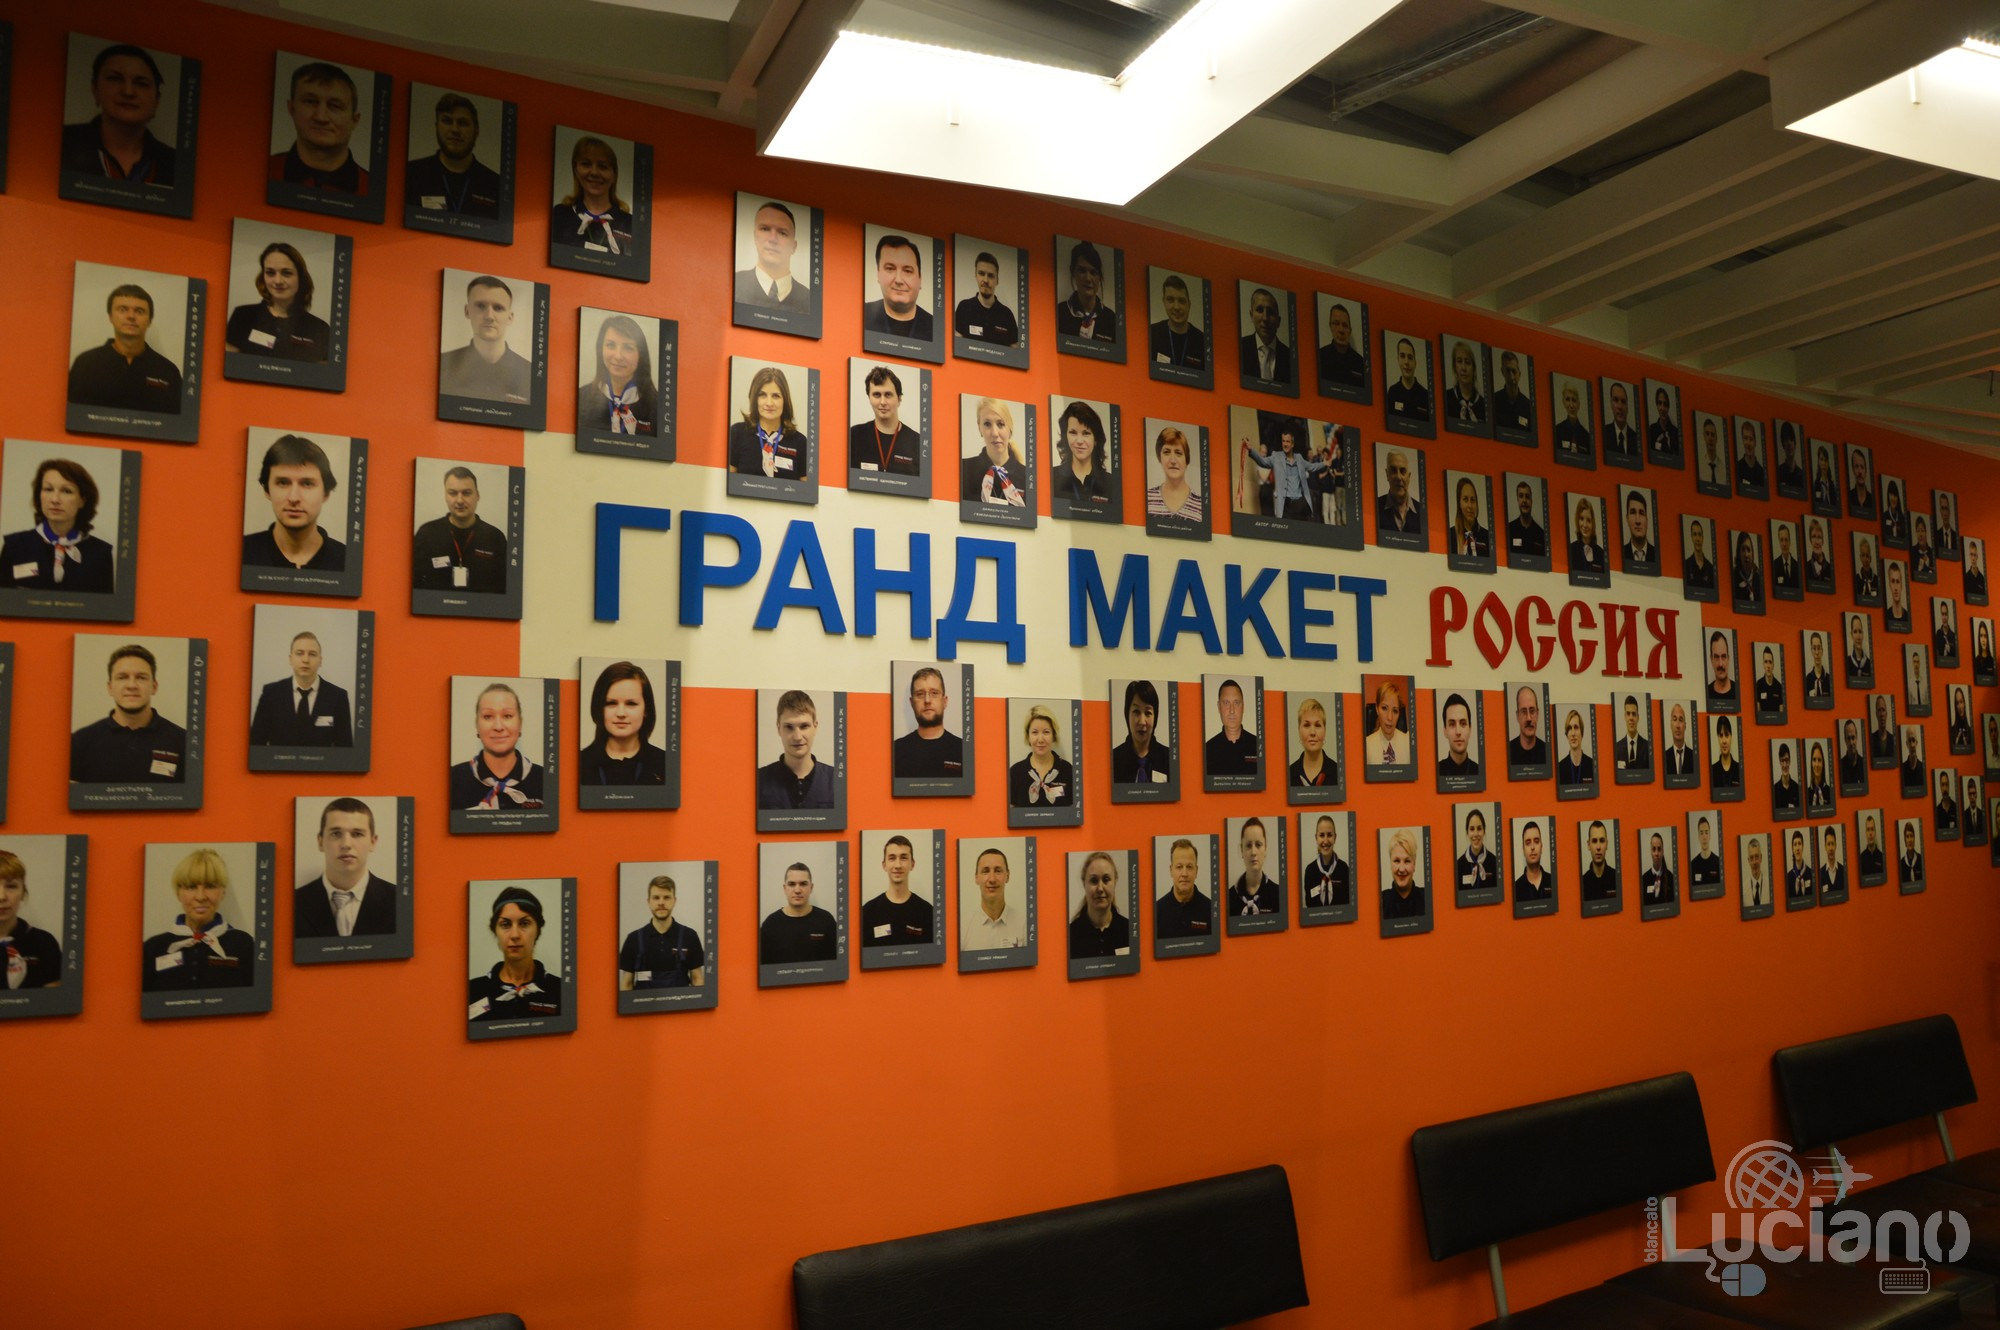 Grand Maket Rossiya - St. Petersburg - Russia